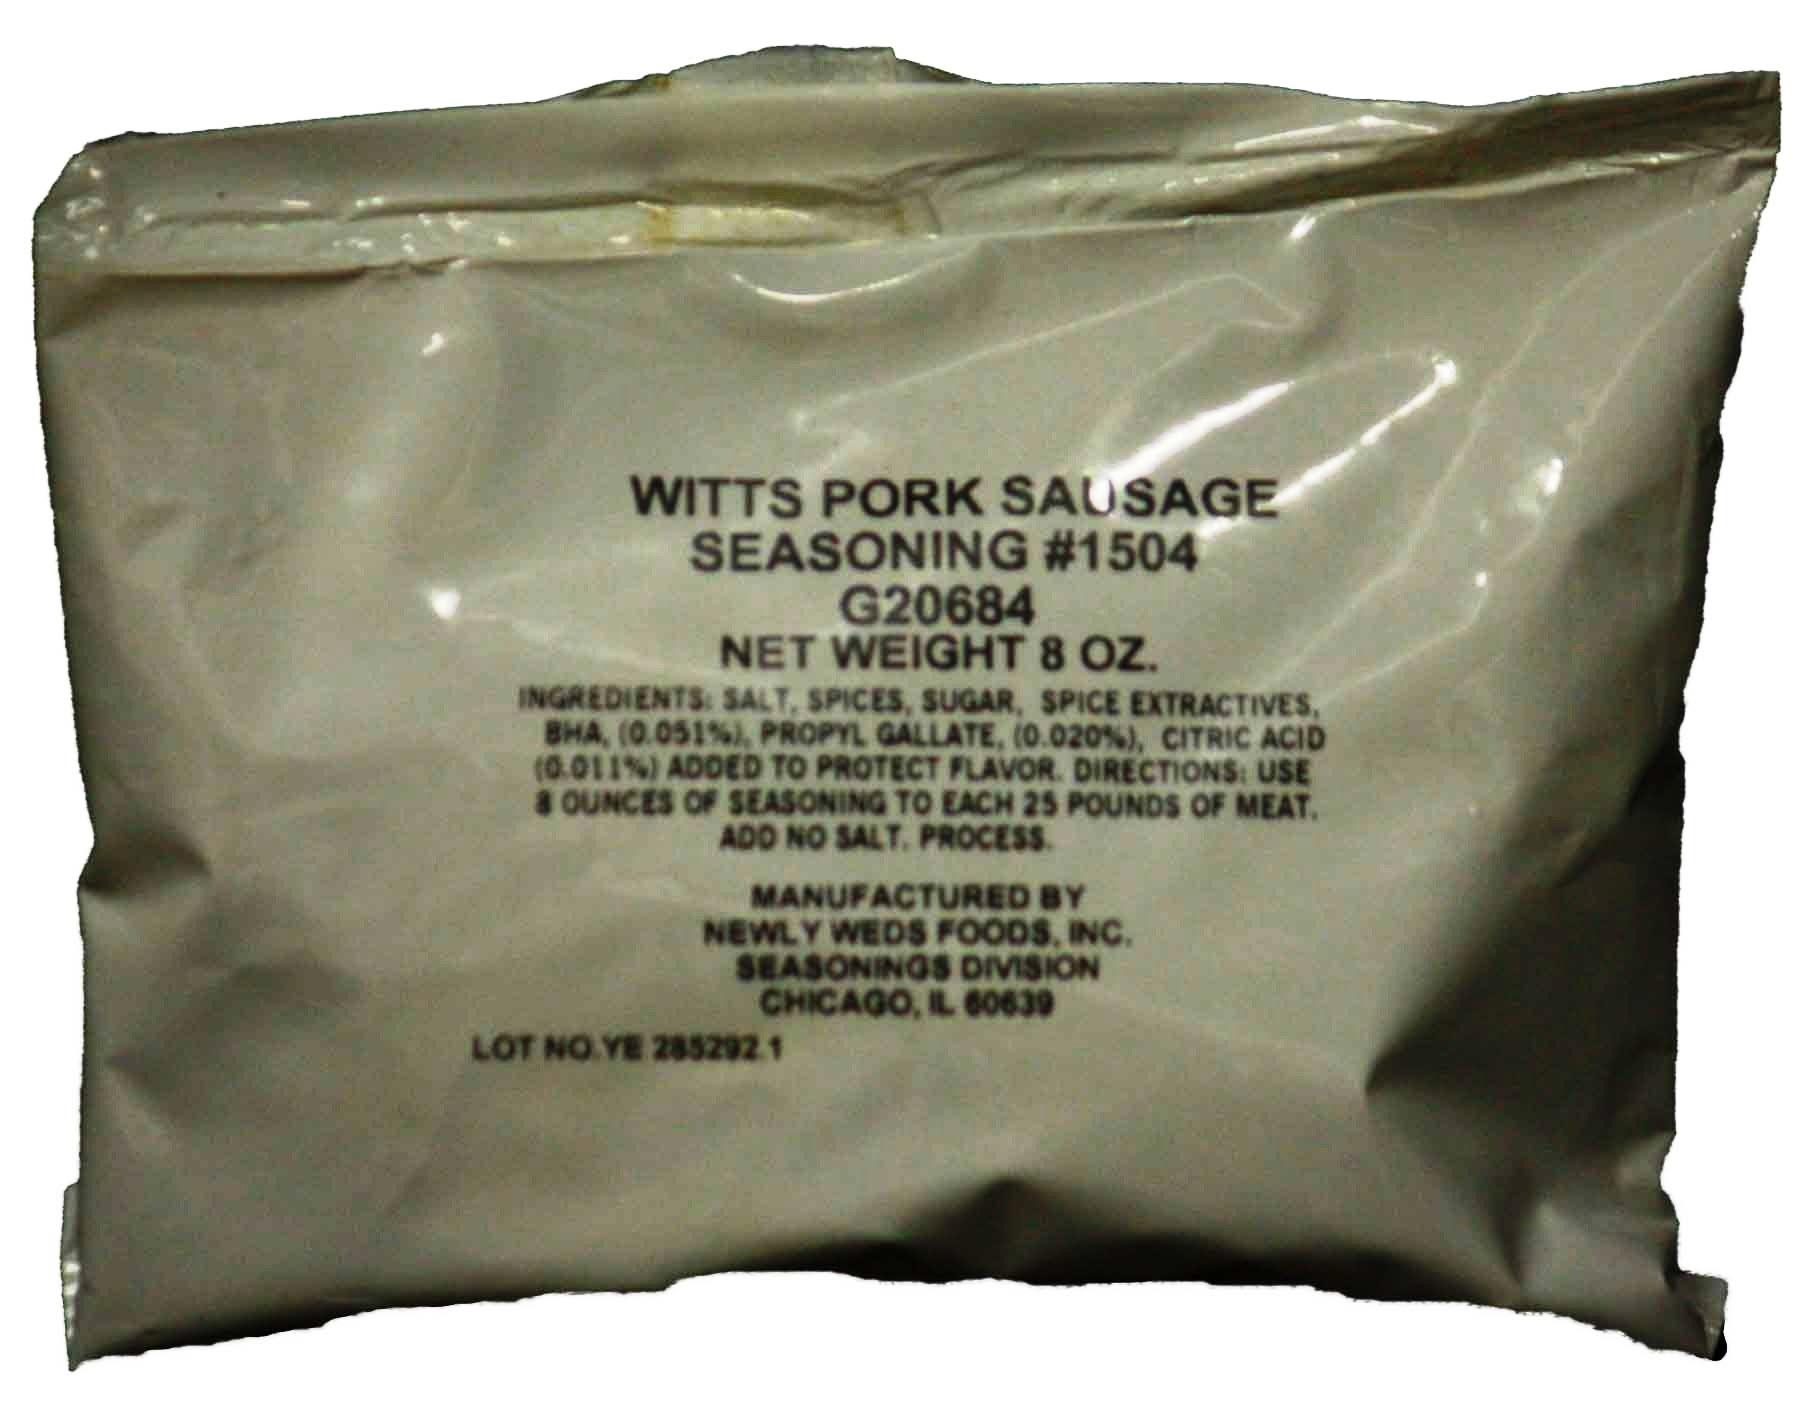 Seguimos contandooooooooooooooo  - Página 17 Witts-pork-Sausage-1504